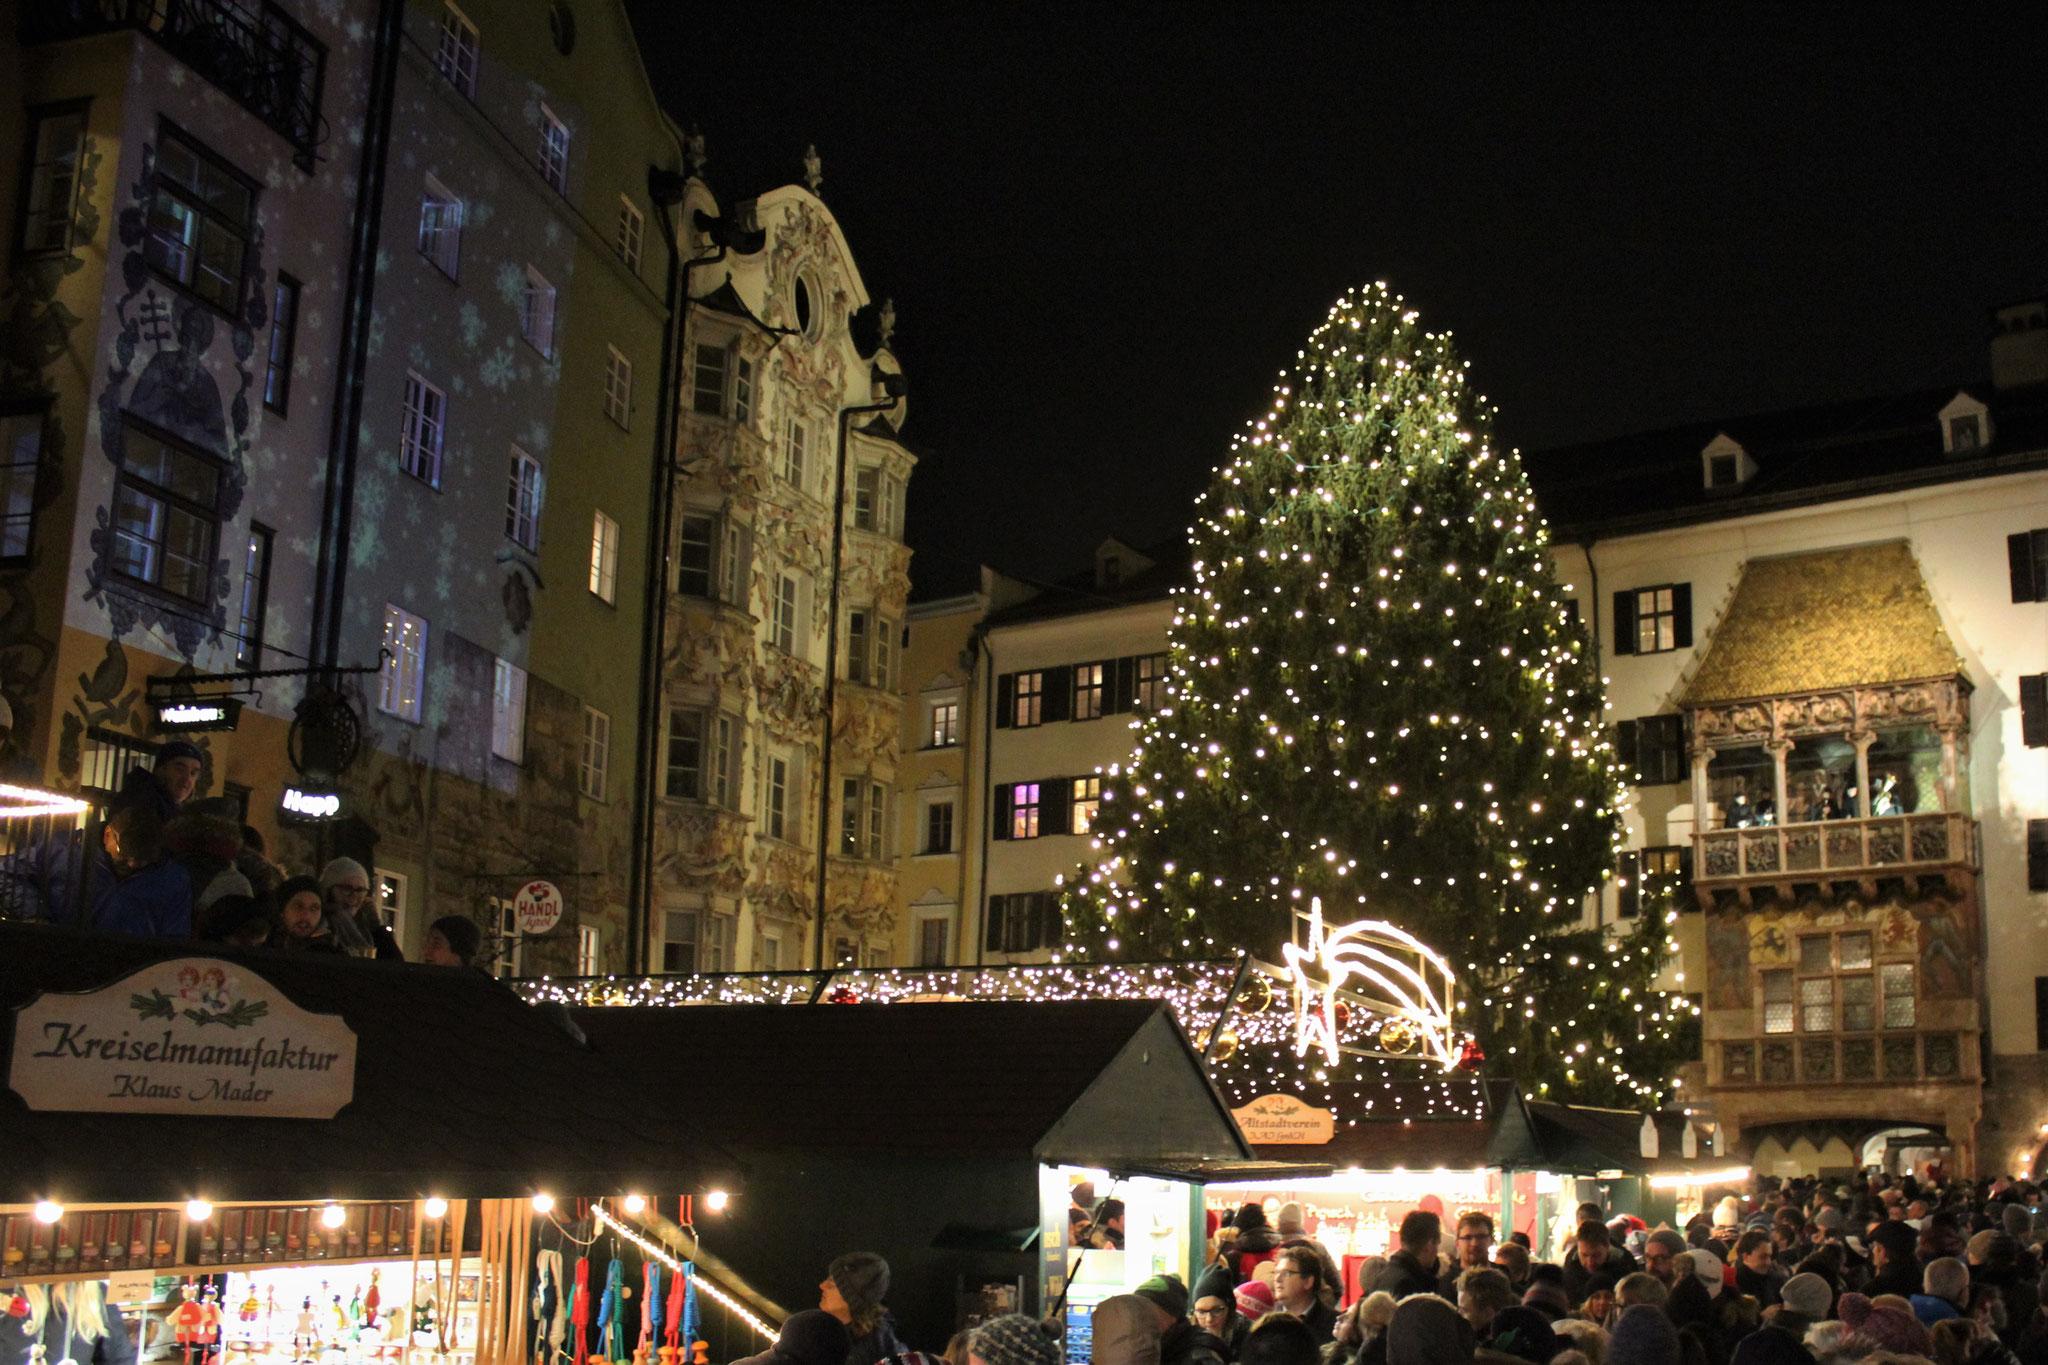 Innsbruck 2017